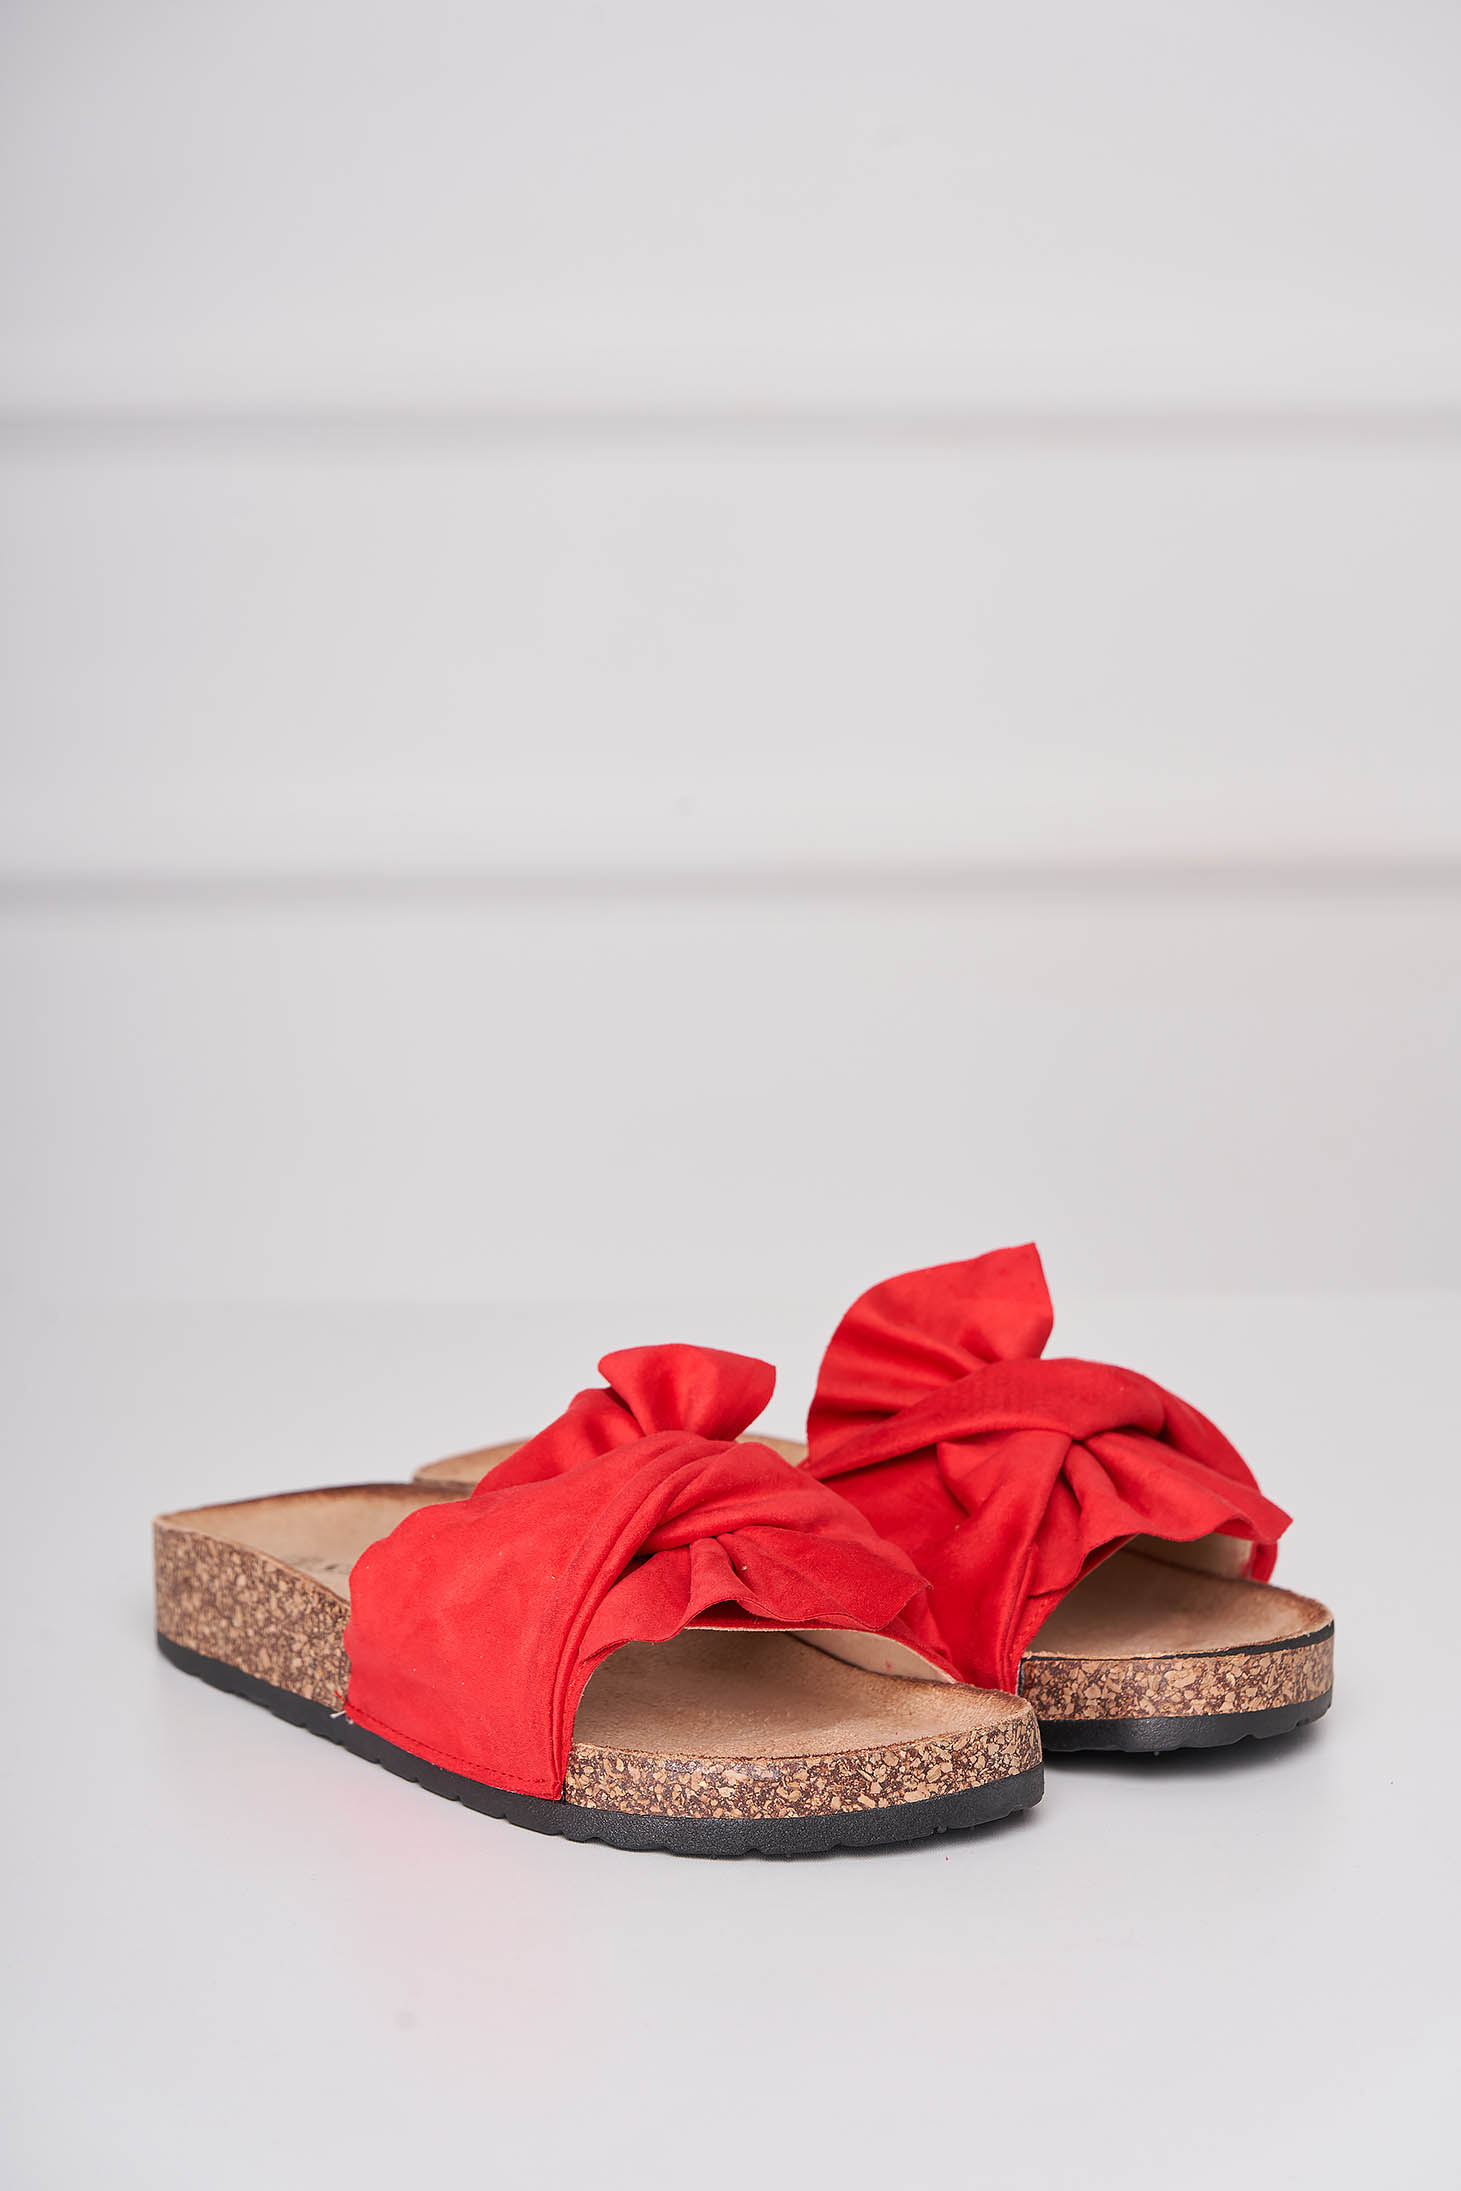 Piros casual papucs bársonyos anyagból lapos talpú